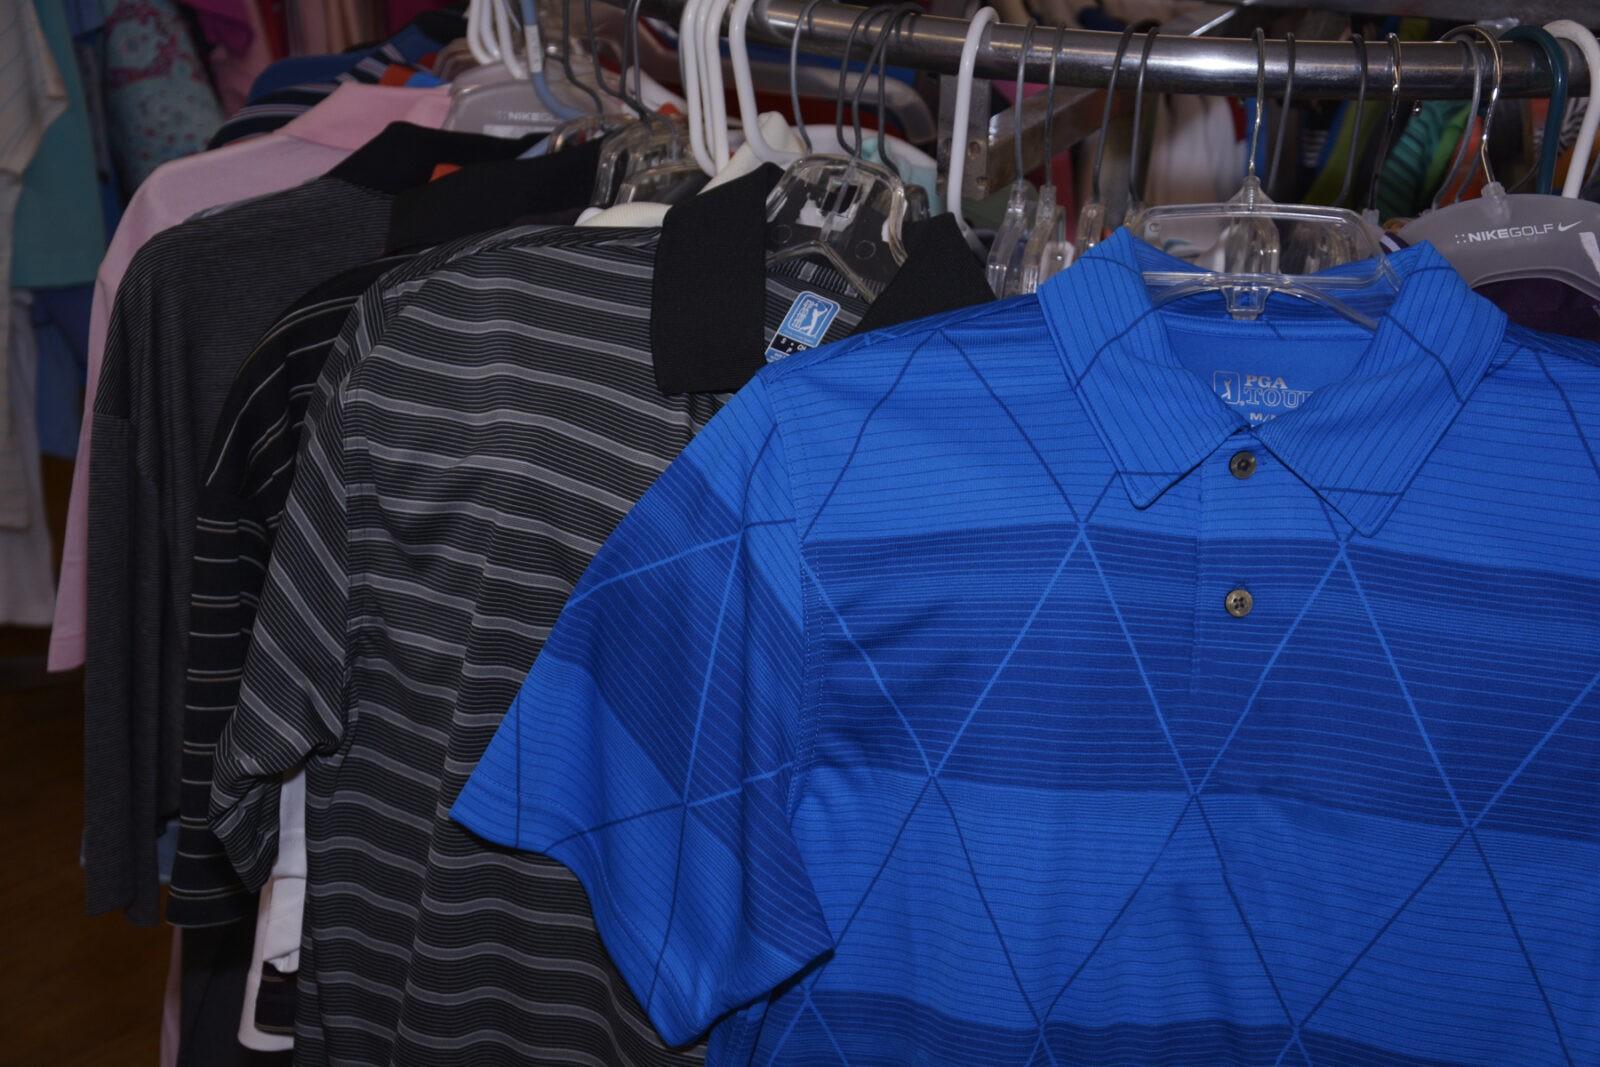 PGA Shirt from Chili